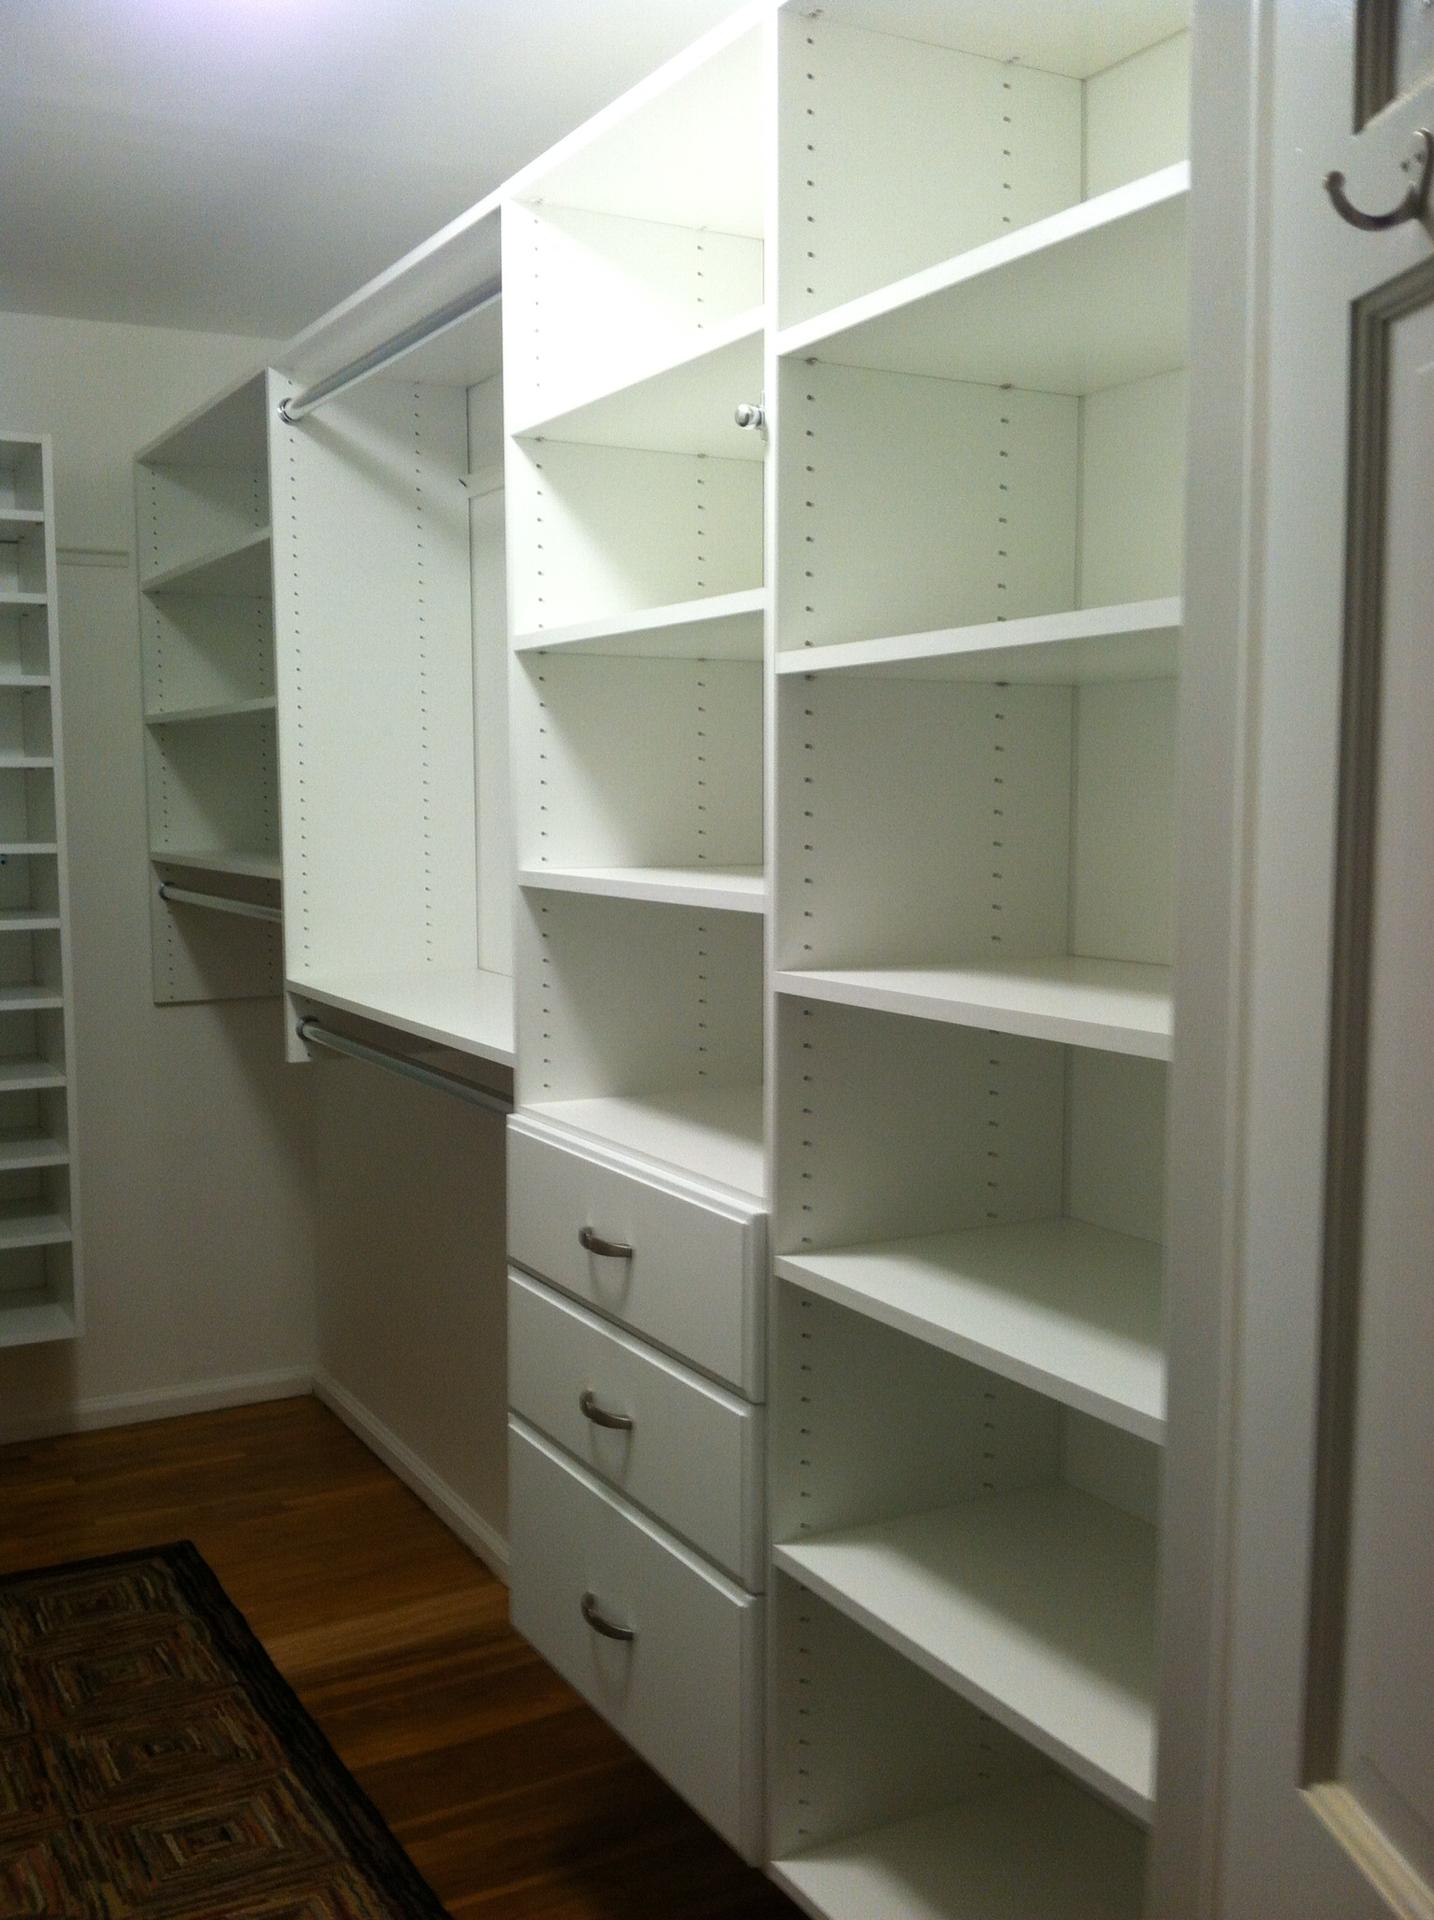 Master Bedroom Closet: After